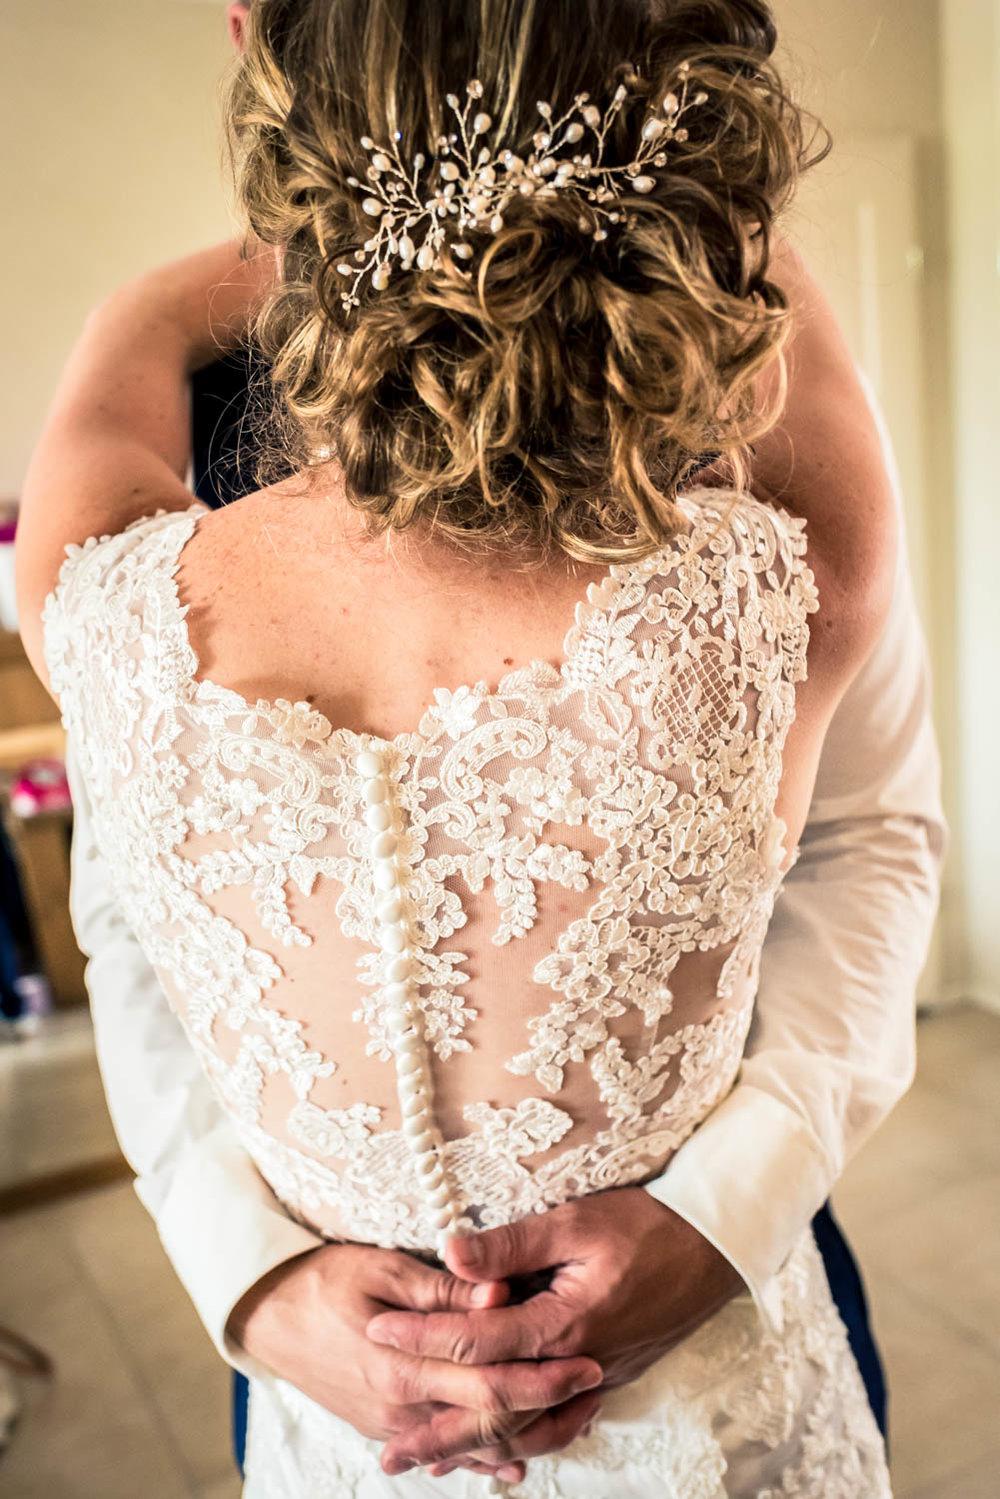 achterkant bruid, prachtige trouwjurk, bruidspaar, trouwfotografie